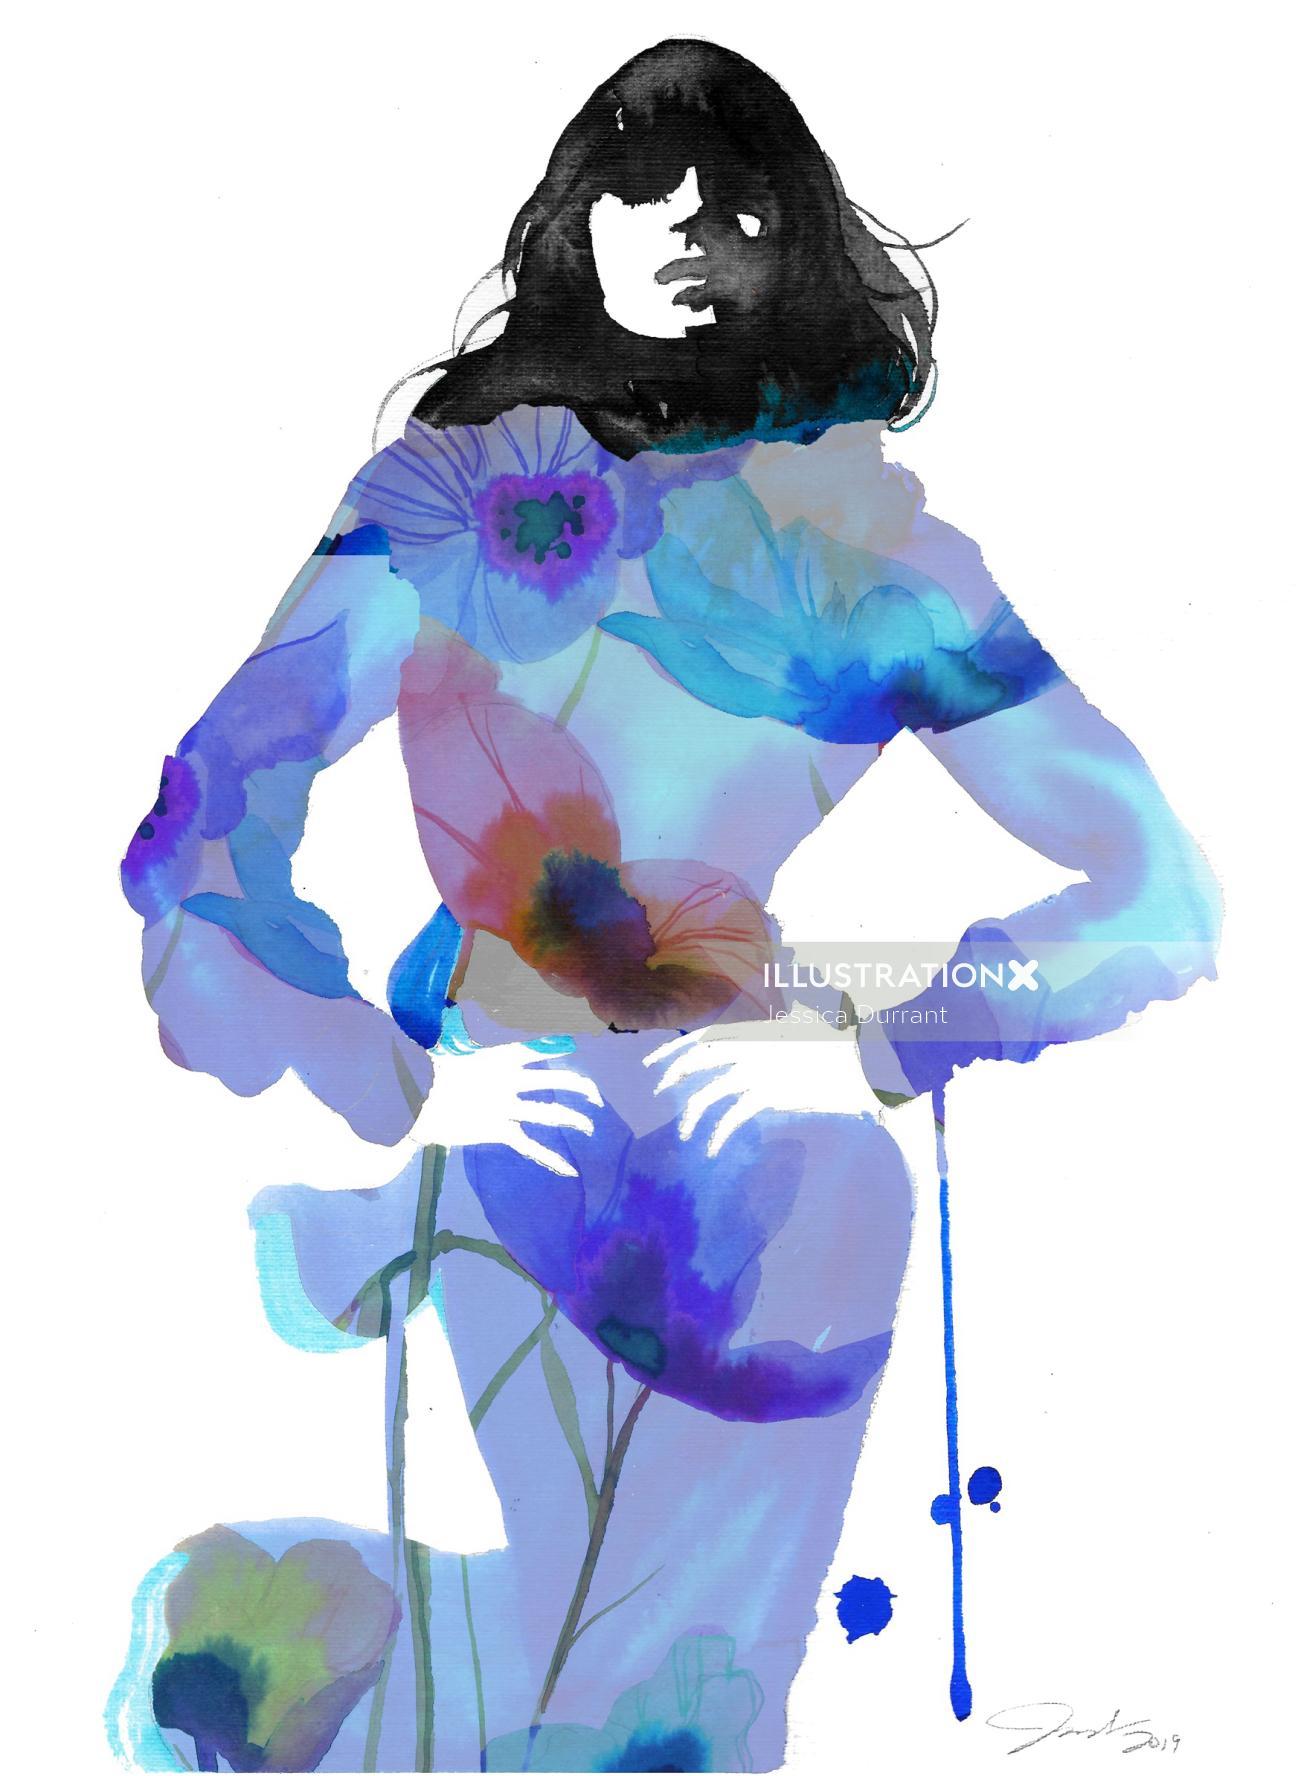 Translucent watercolour drawn beauty